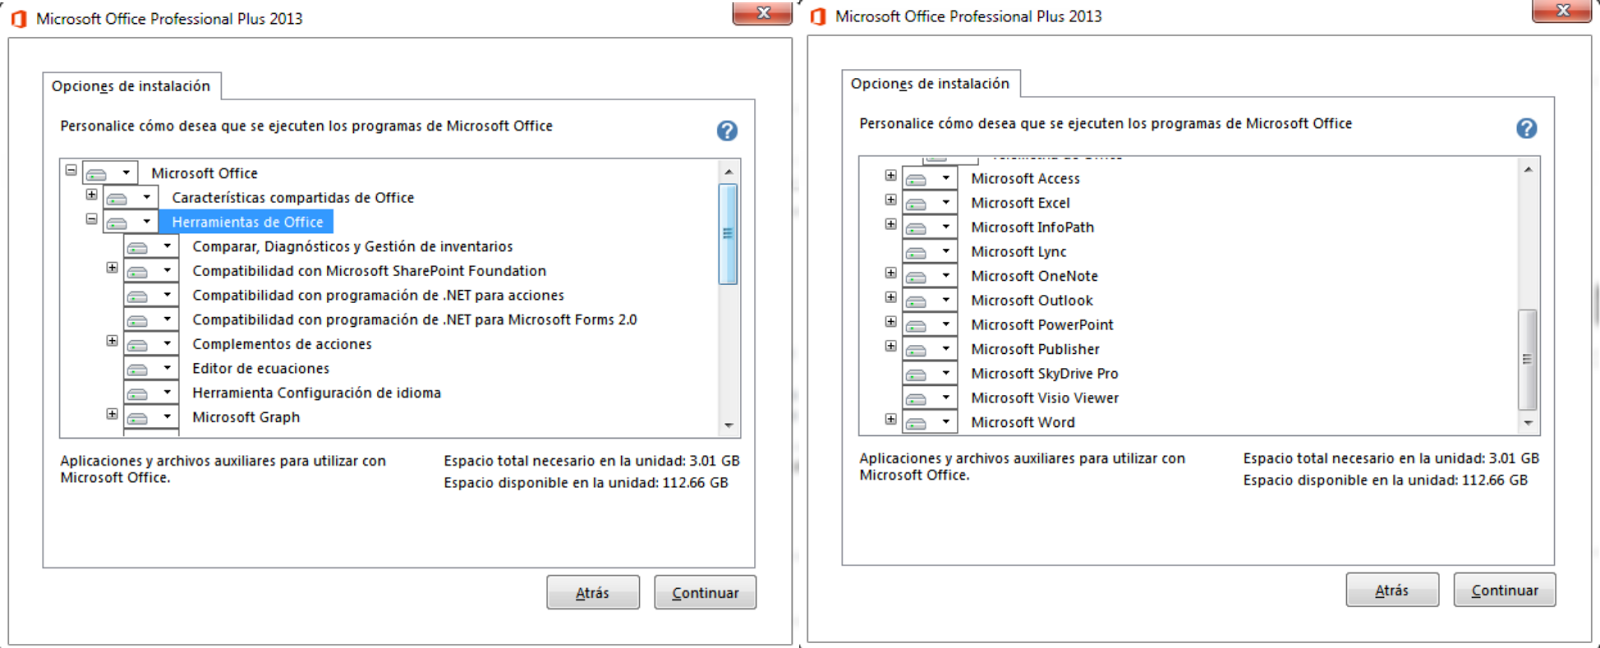 descargar crack para windows 7 professional 32 bits gratis